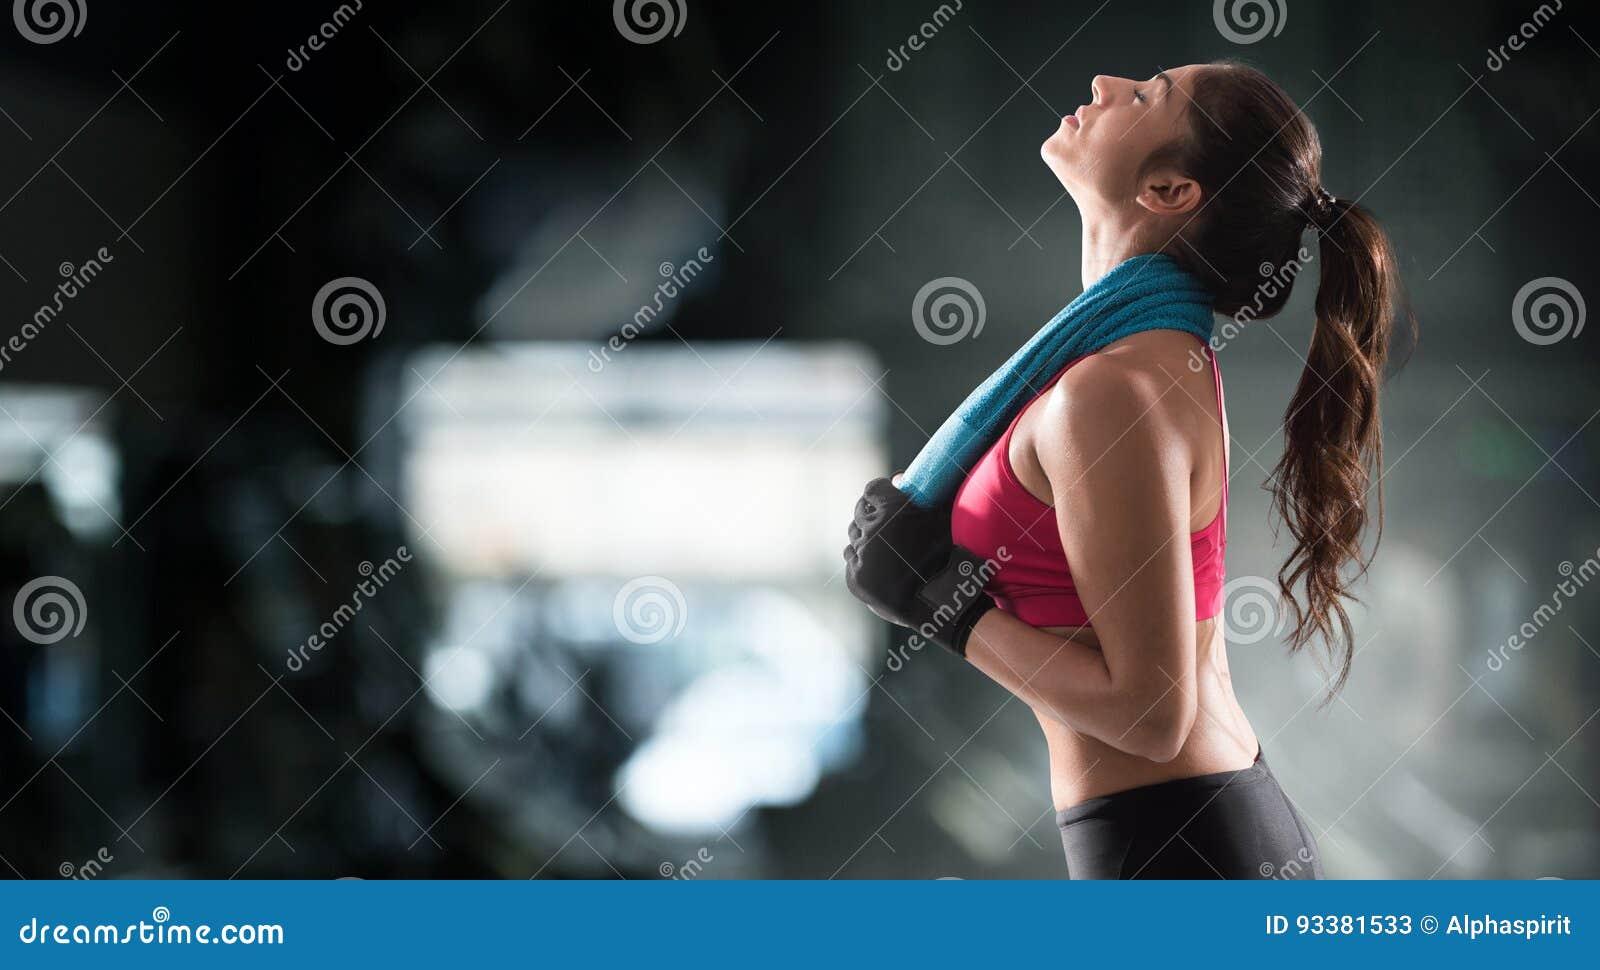 Frau nach Turnhallentraining